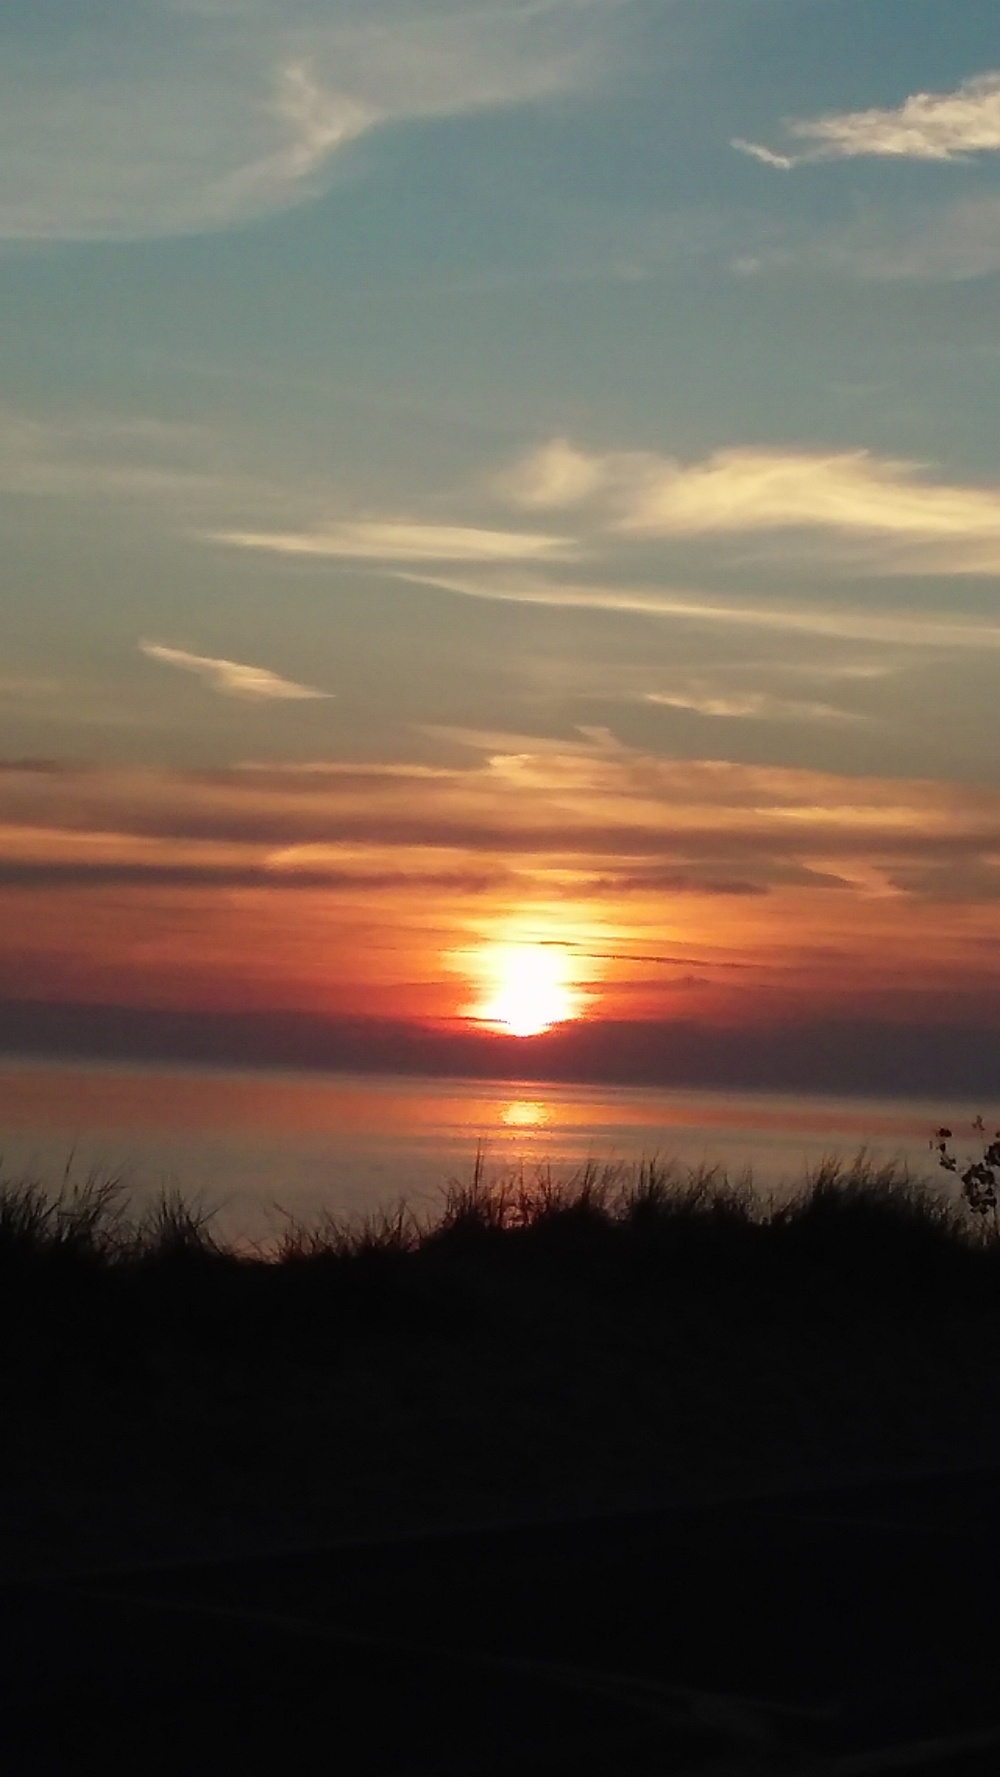 sunset3 052720